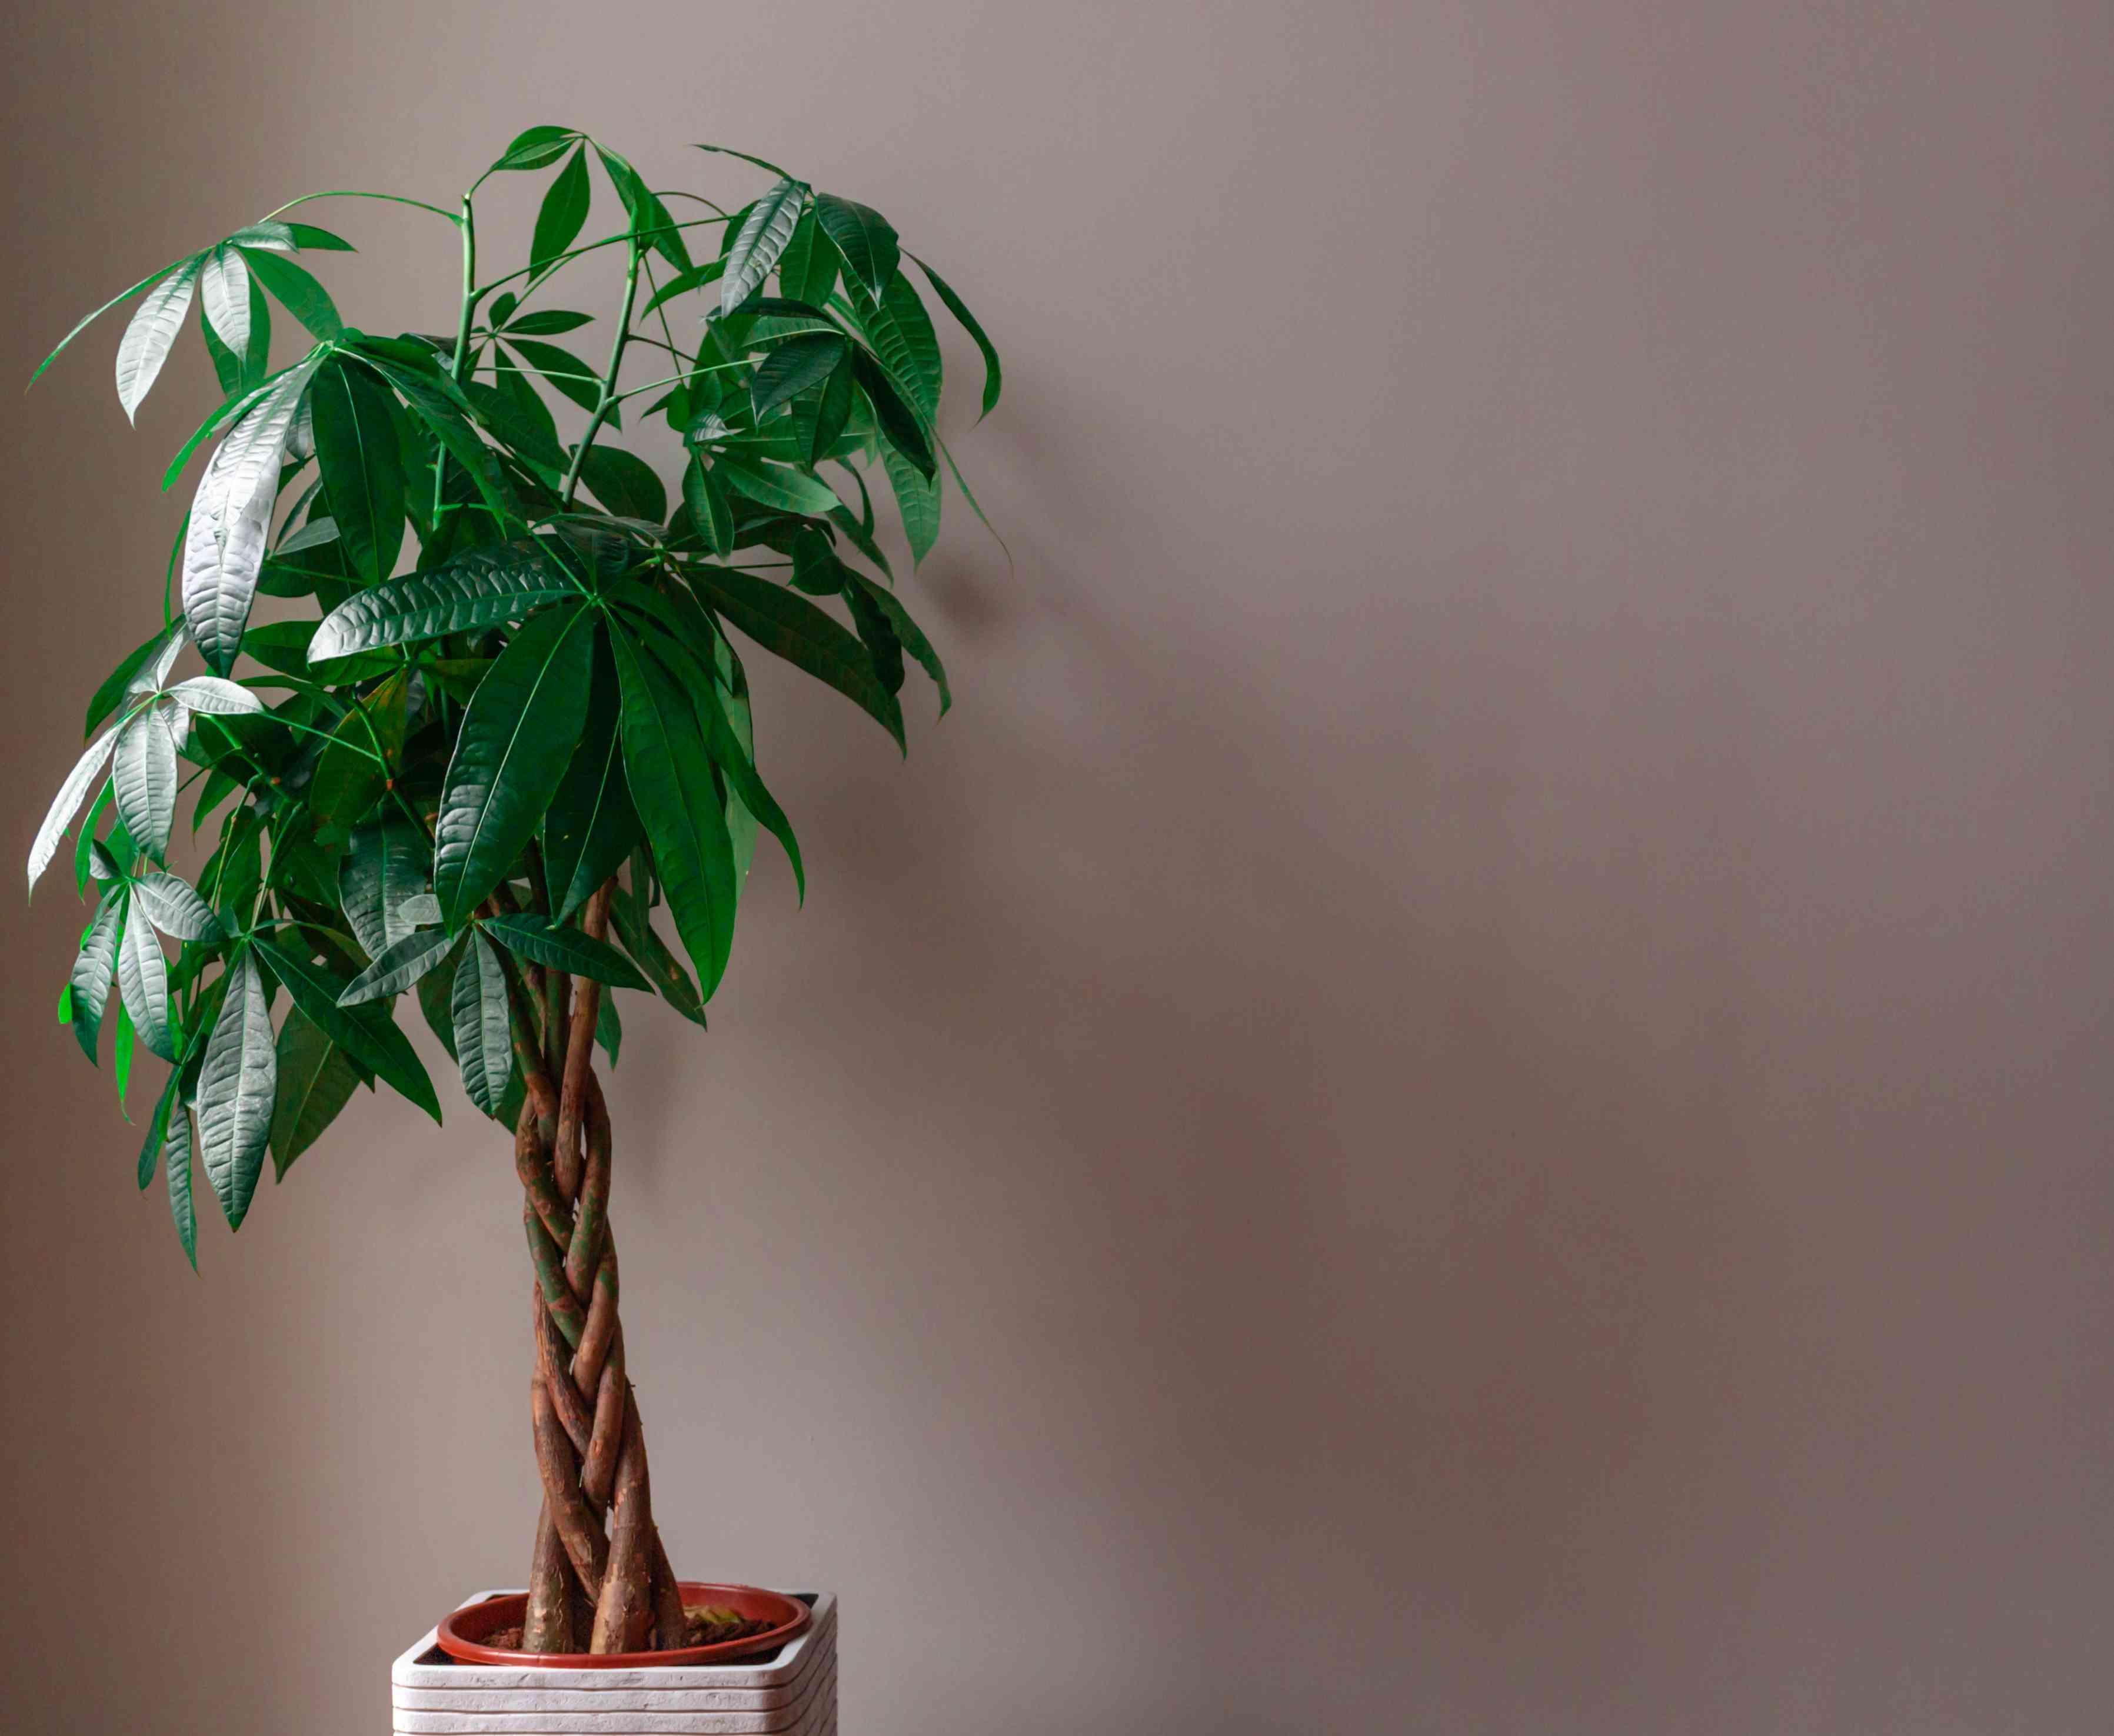 A money tree against a tan wall.